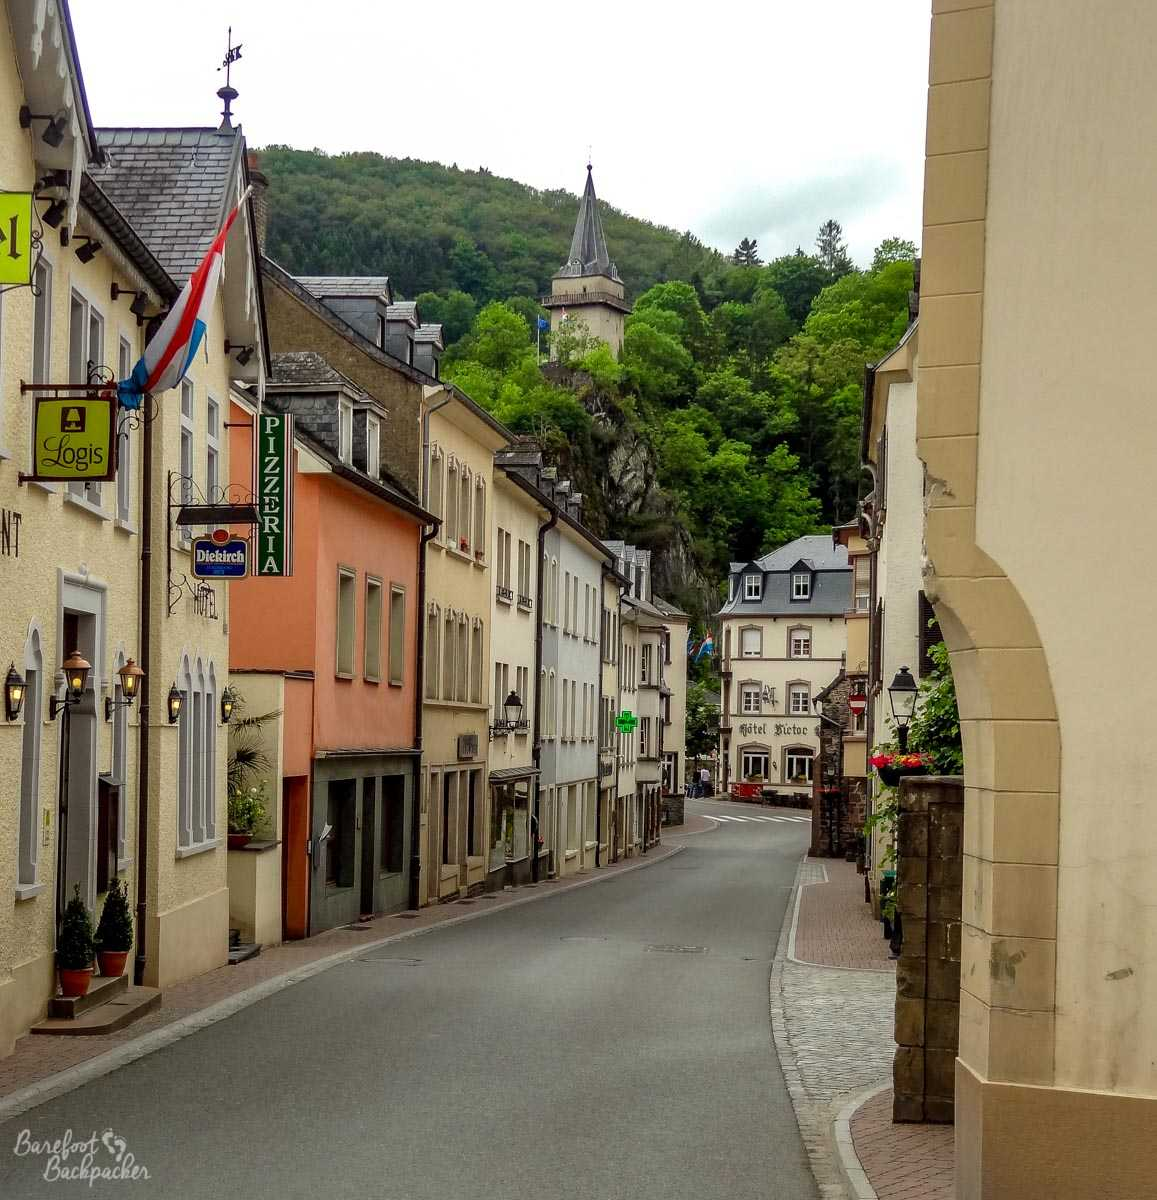 Vianden from street level